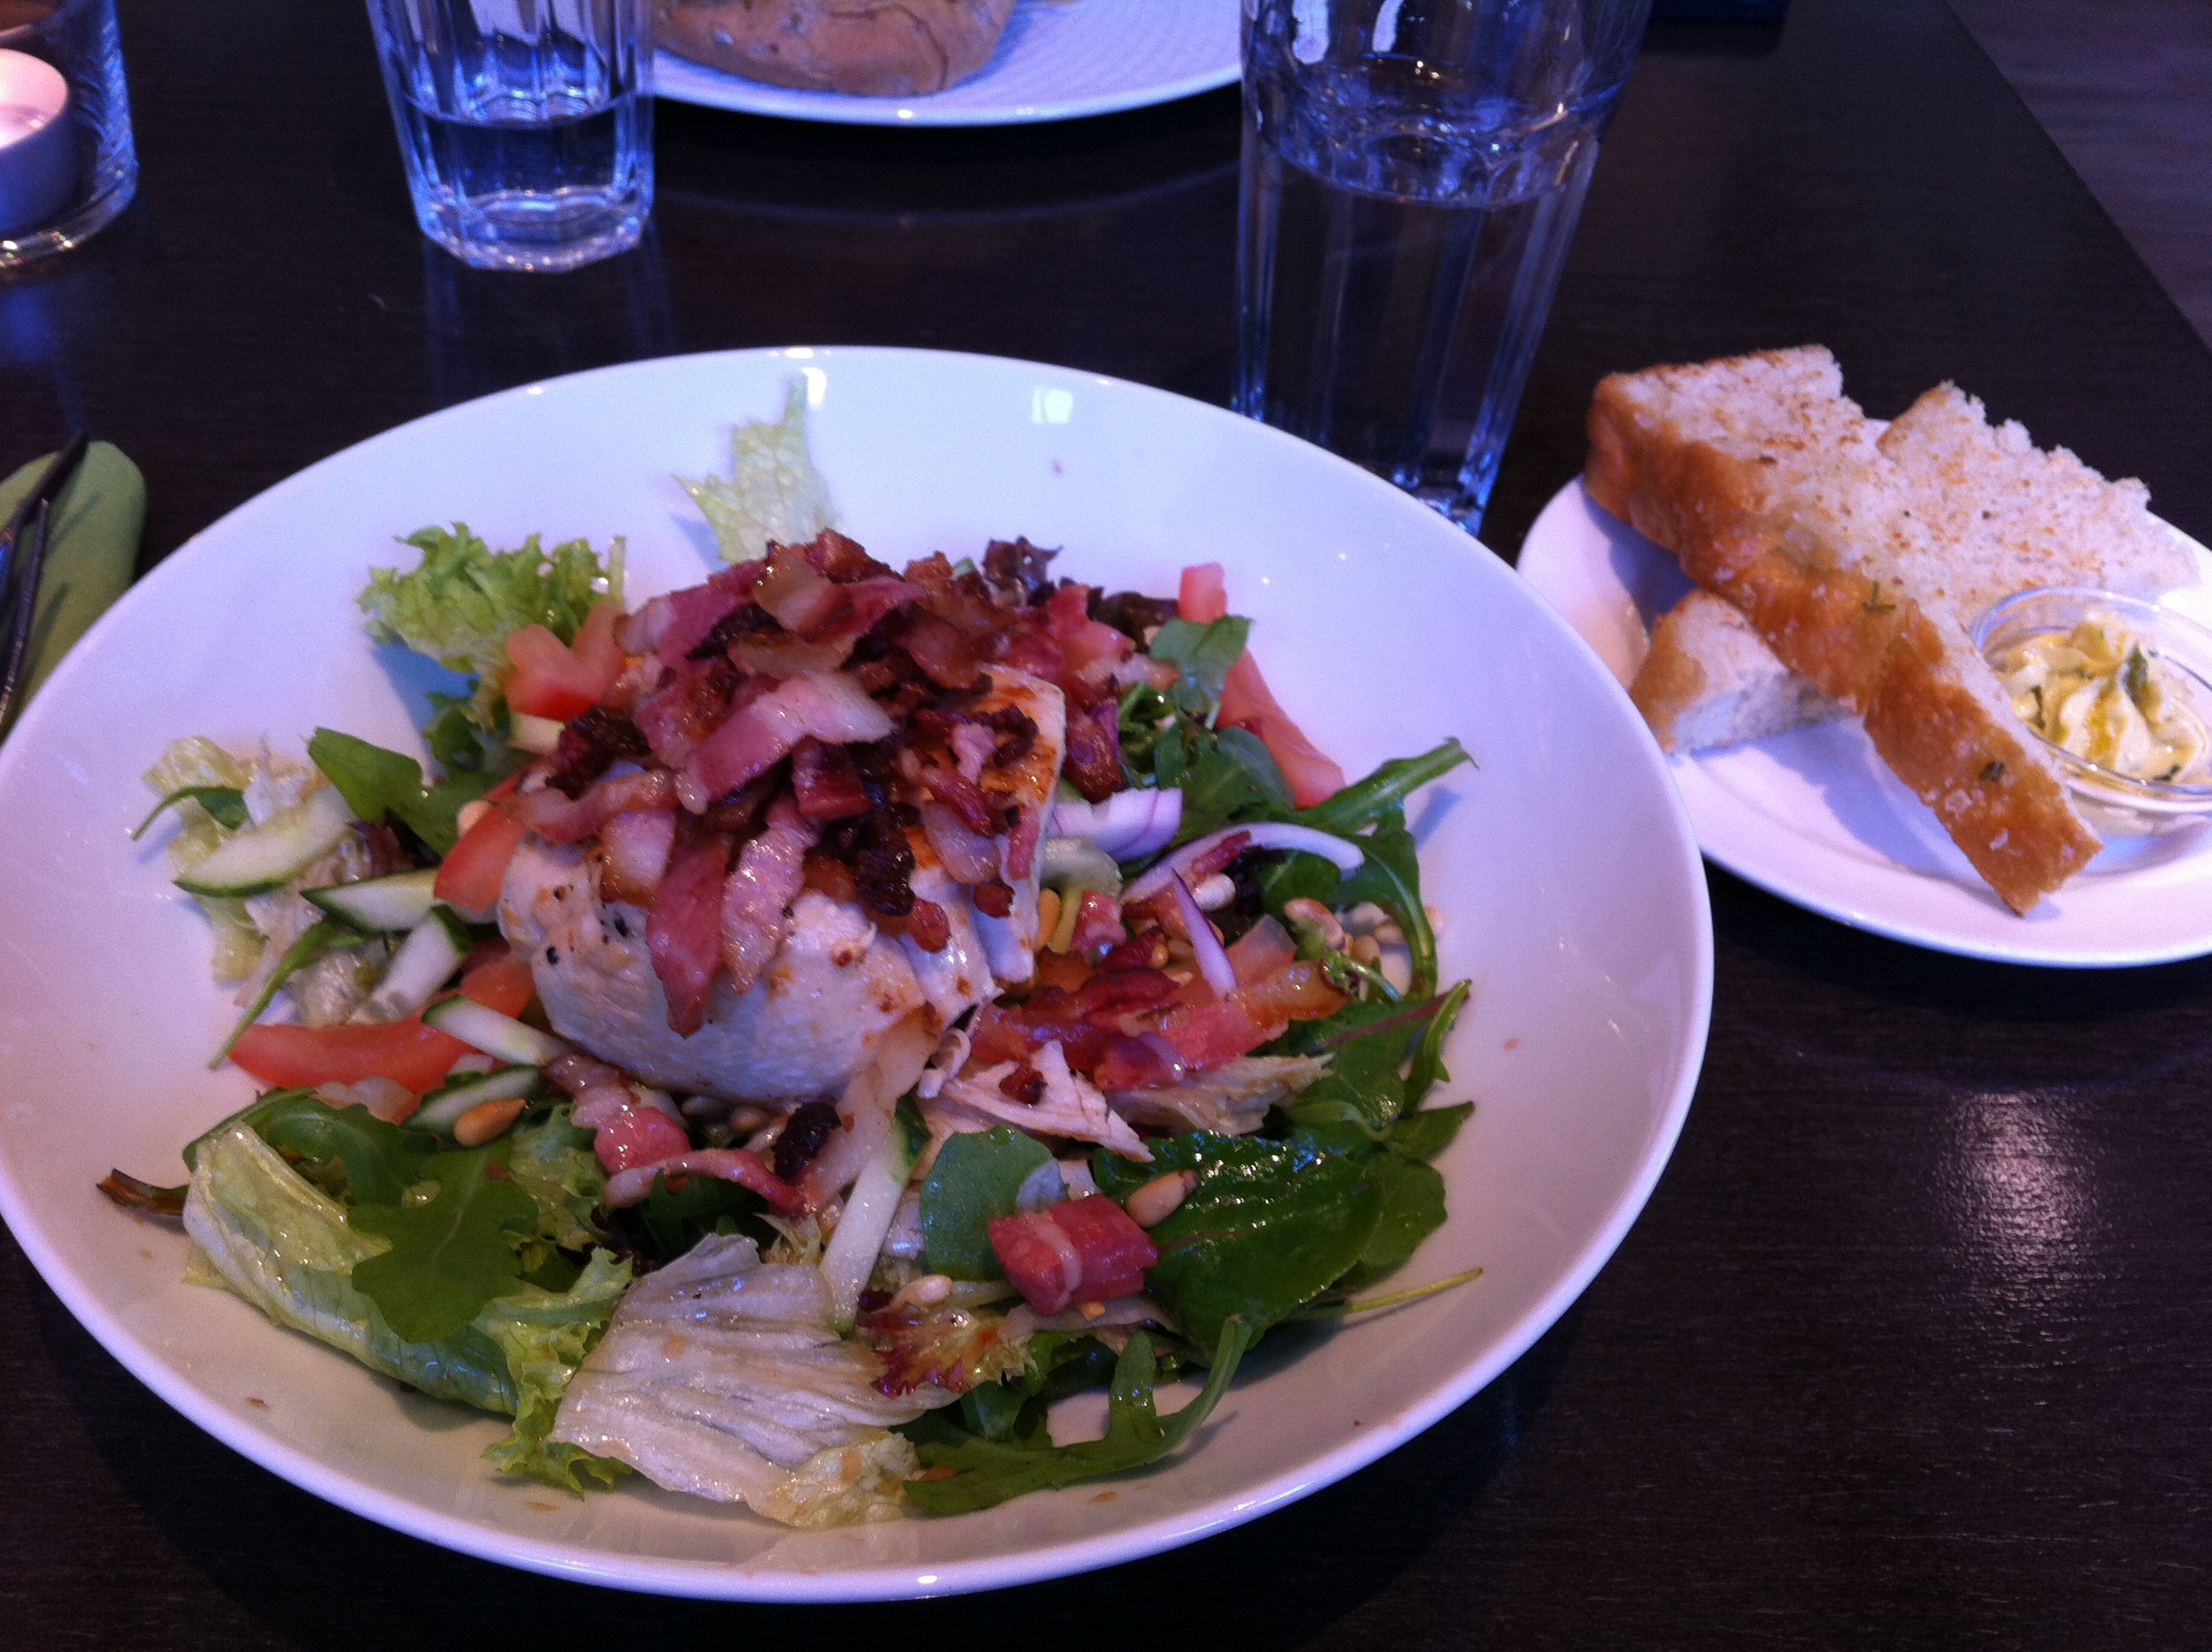 Mer salat - yammi igjen!